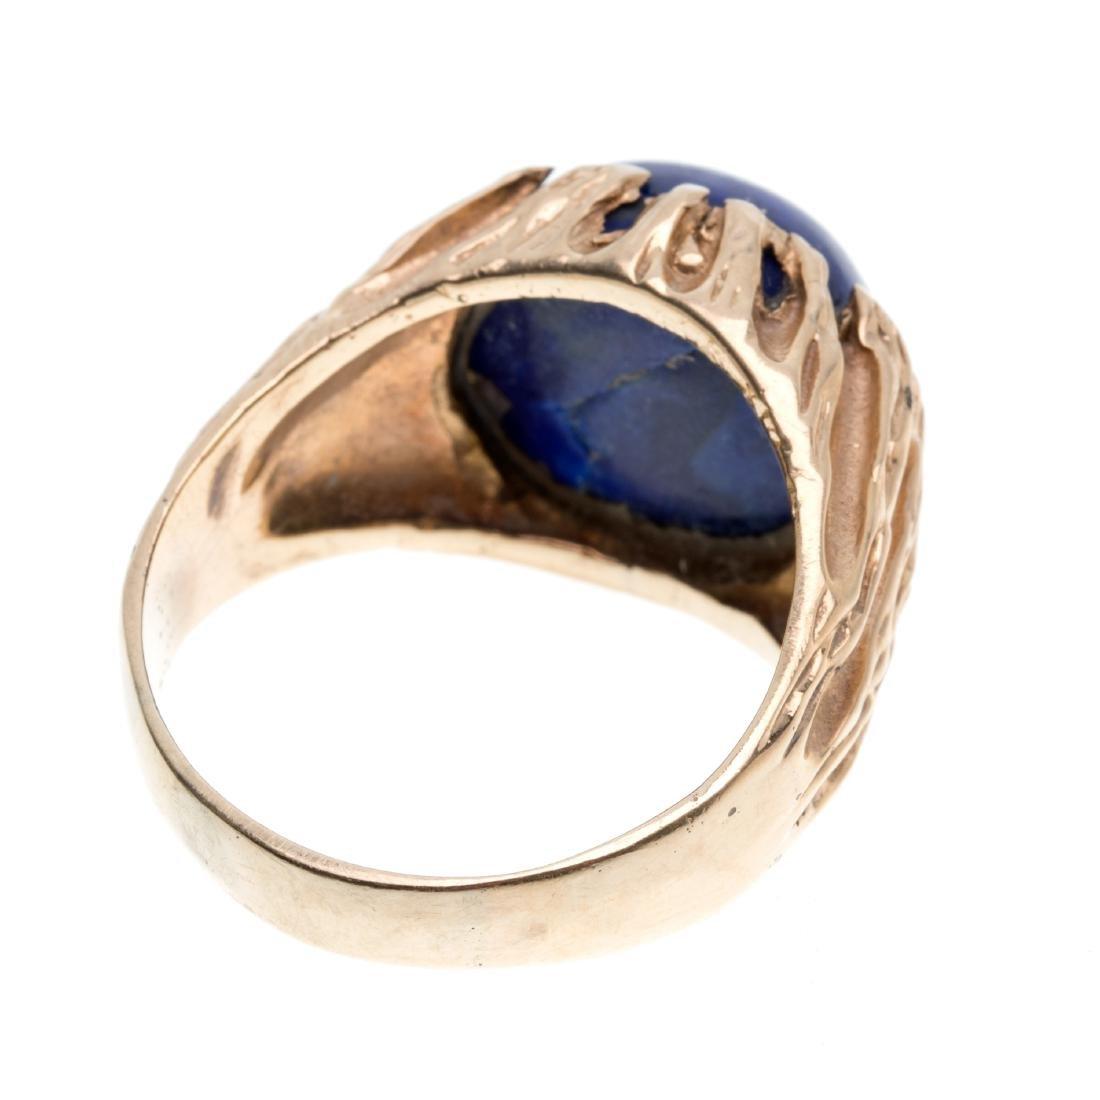 A gent's lapis lazuli, 14k ring - 2